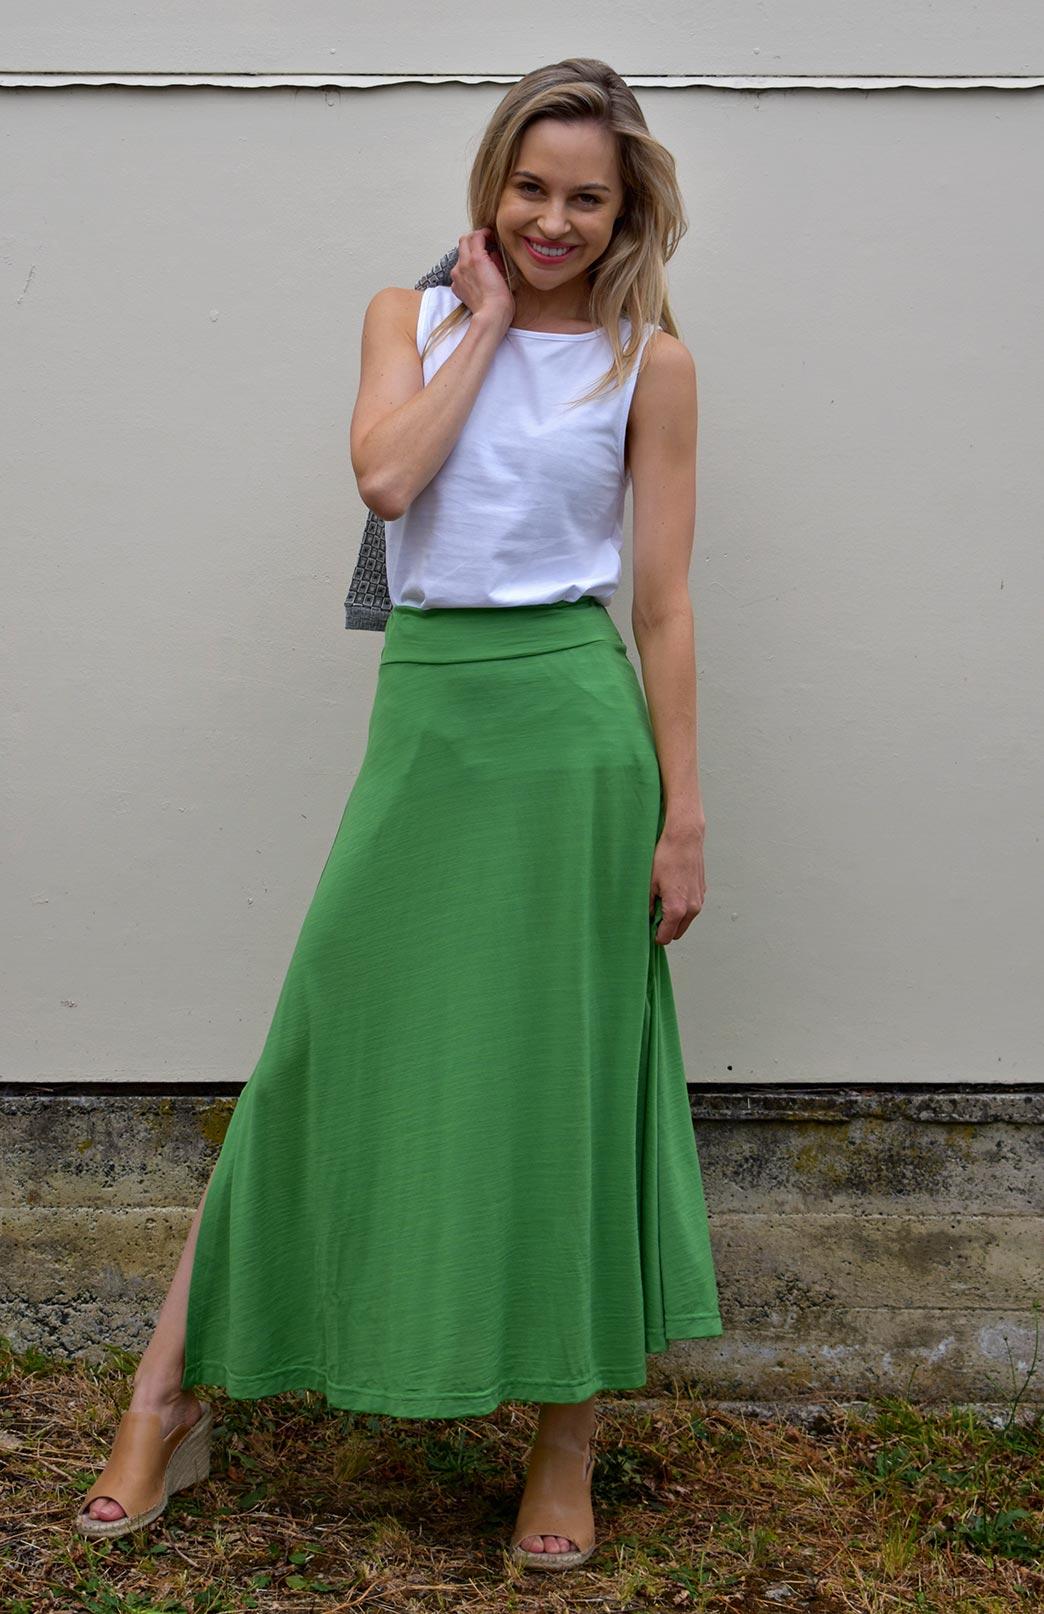 Marion Maxi Skirt - Women's Kiwi Green Merino Wool Maxi Skirt - Smitten Merino Tasmania Australia